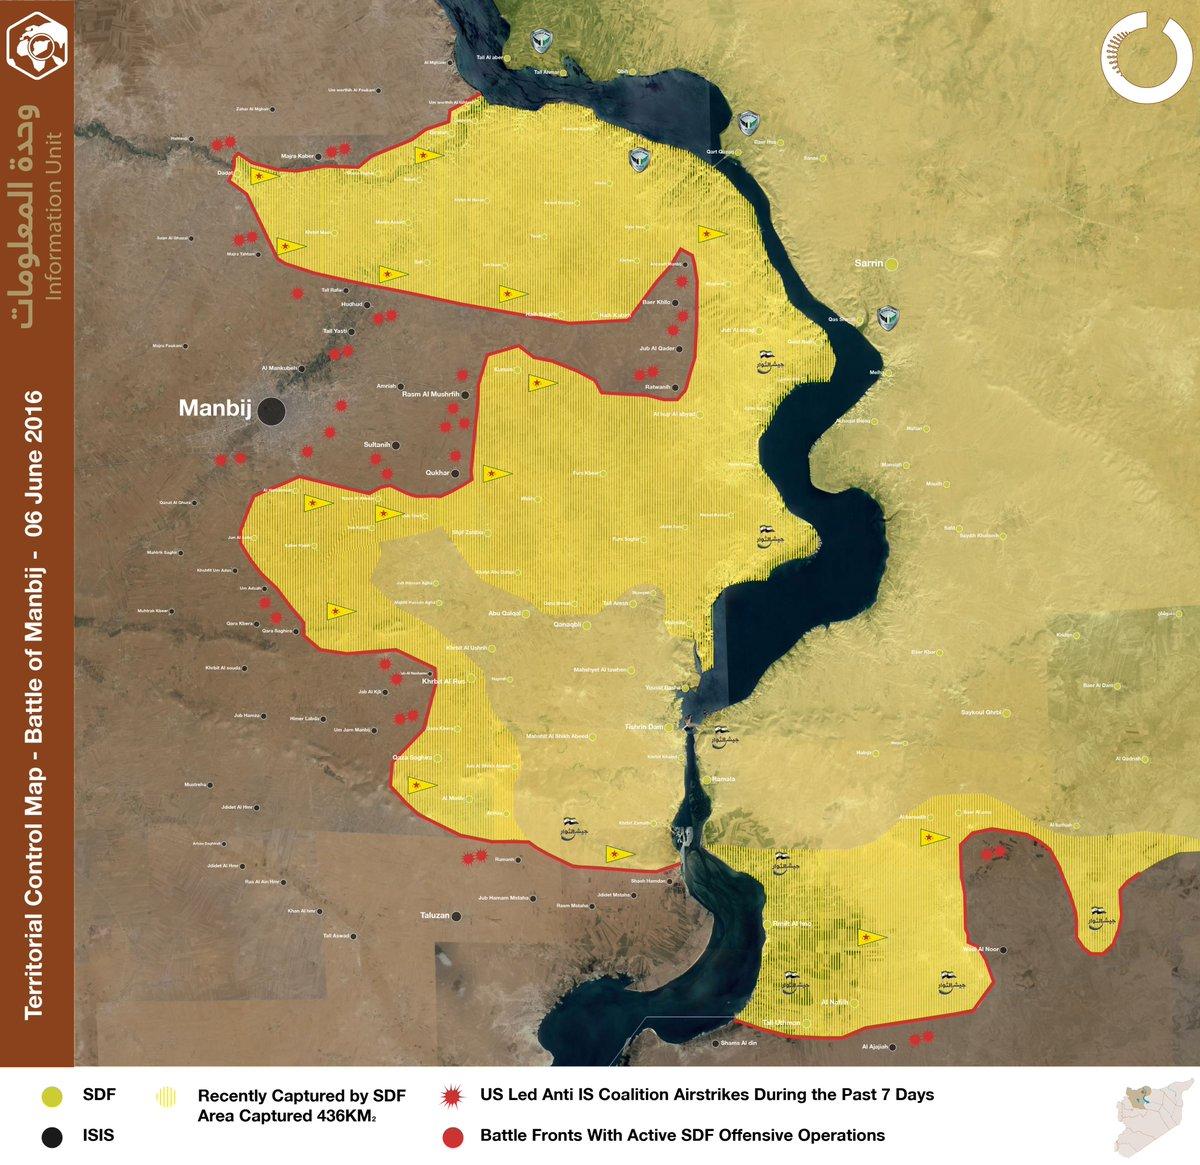 Syria: Battle for Manbij on June 6